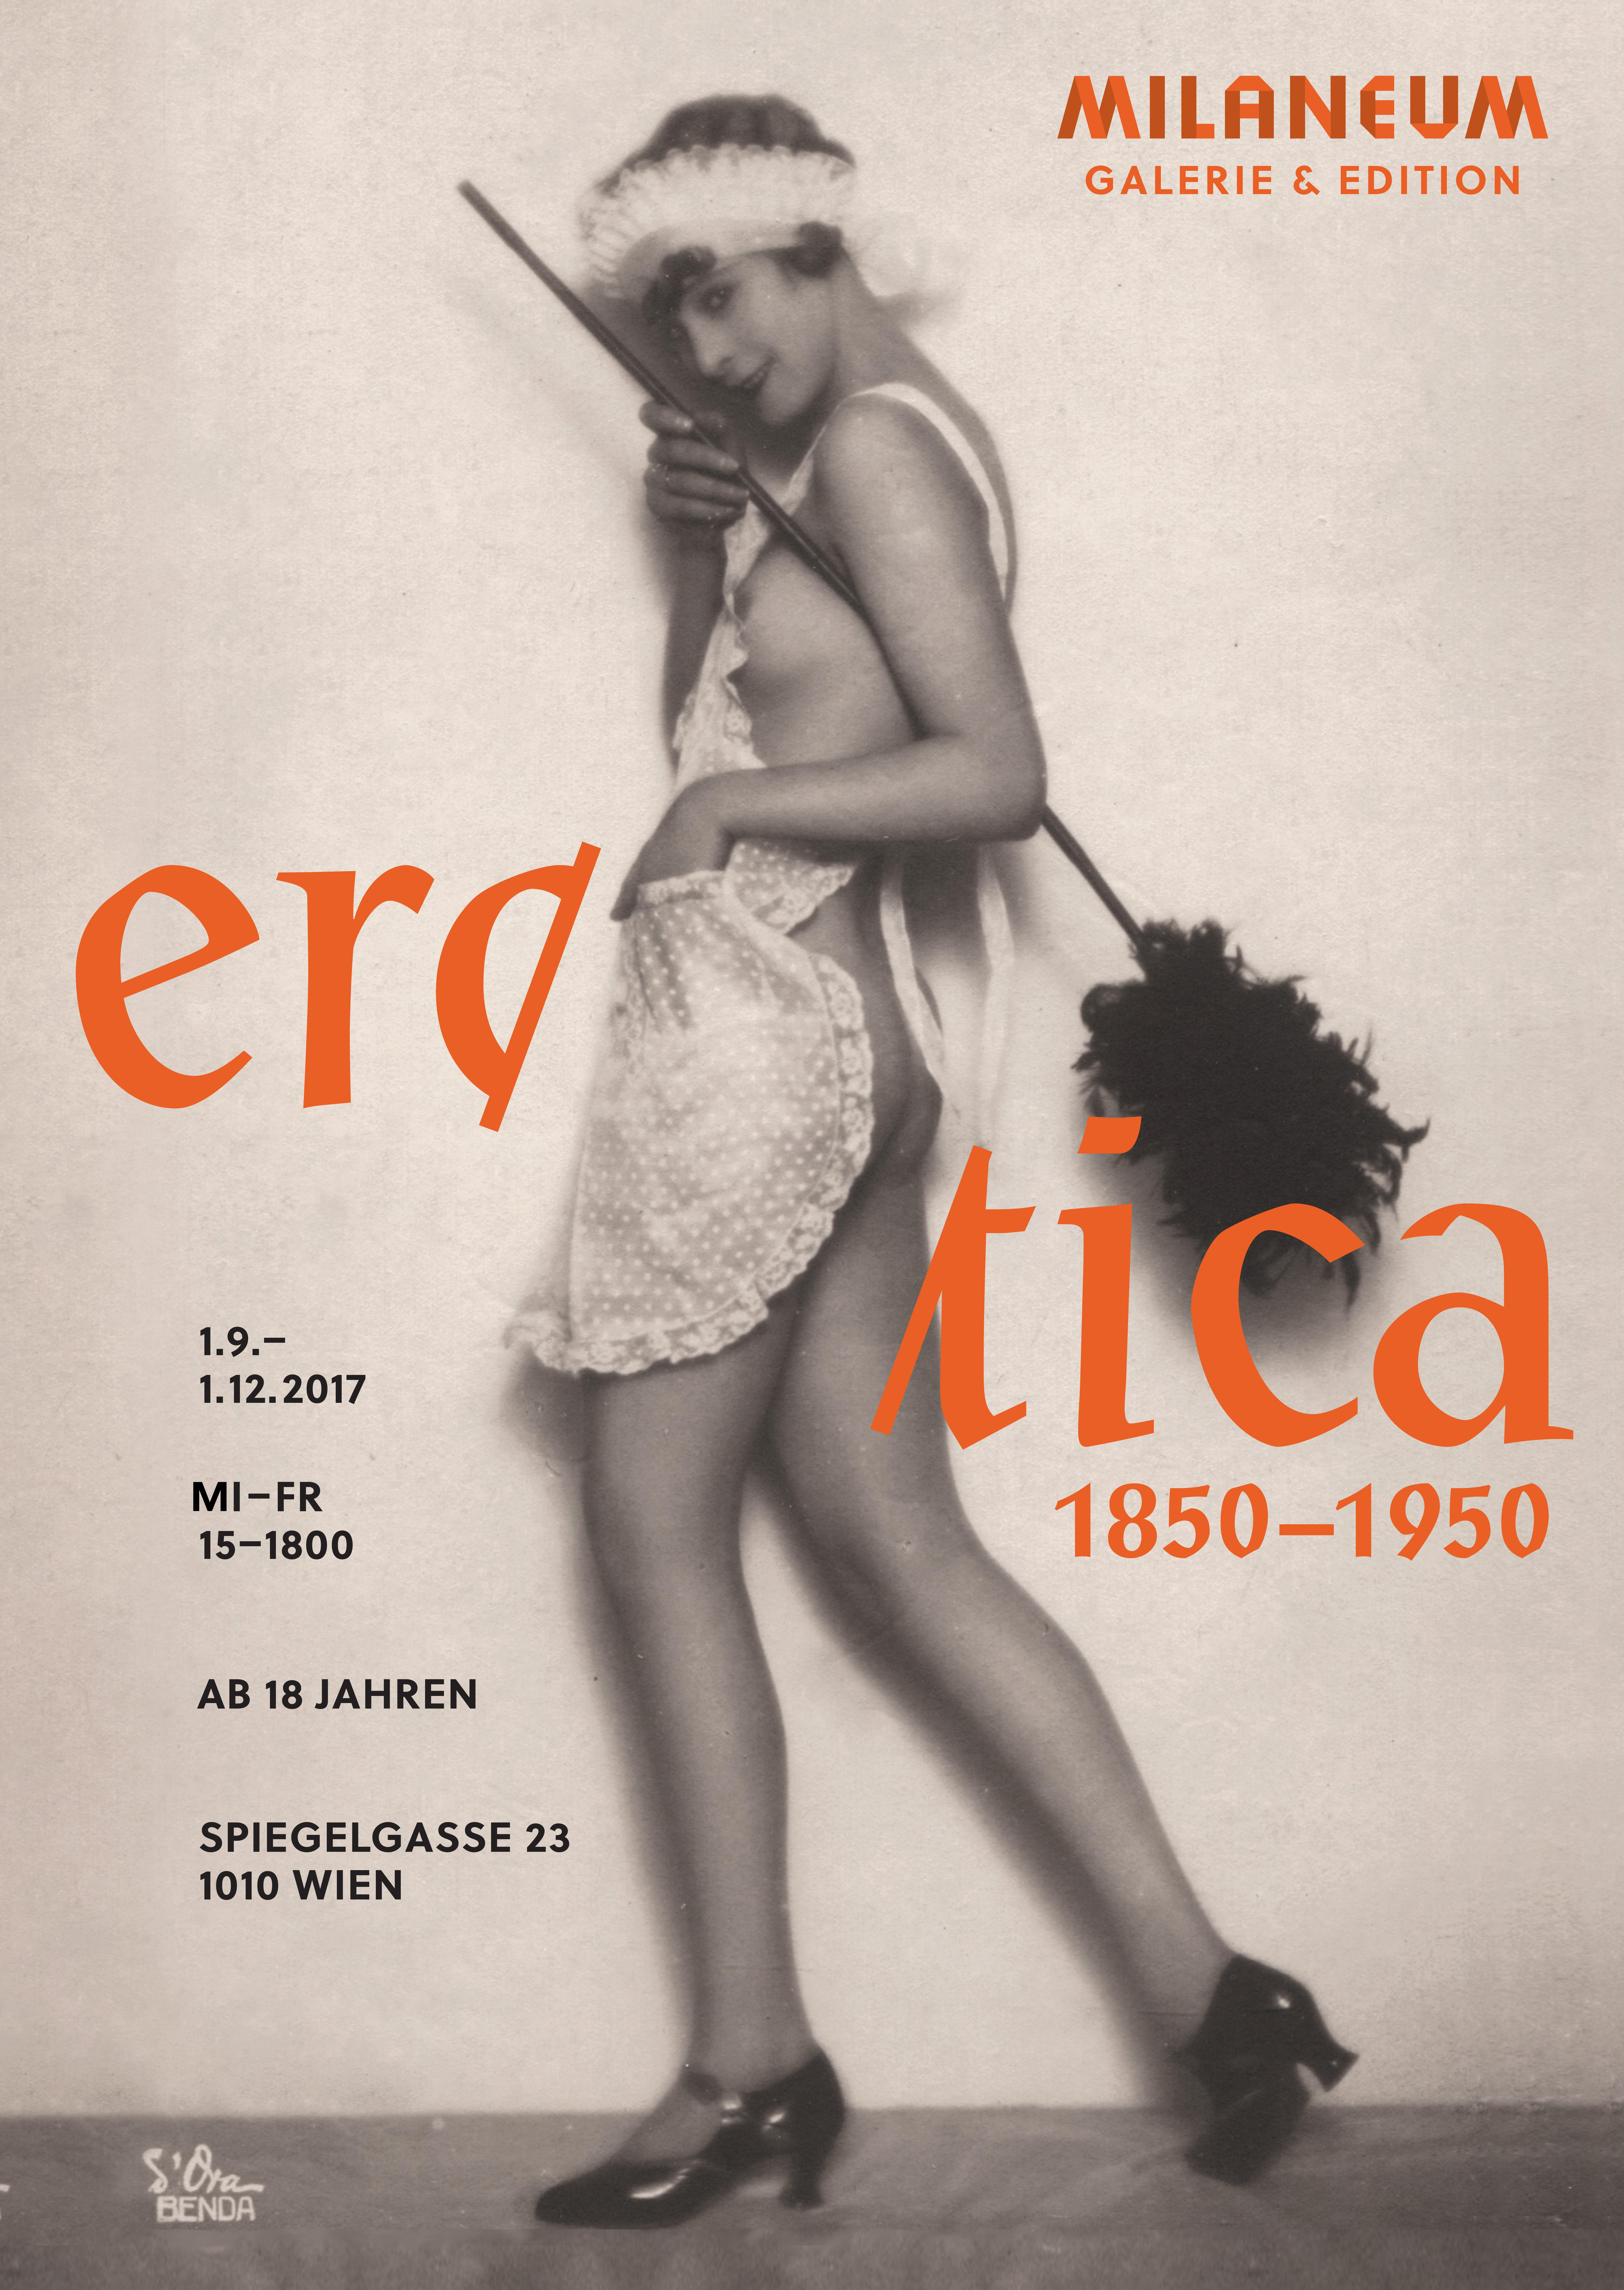 Erotica-Plakat_RZ_Pfade.indd